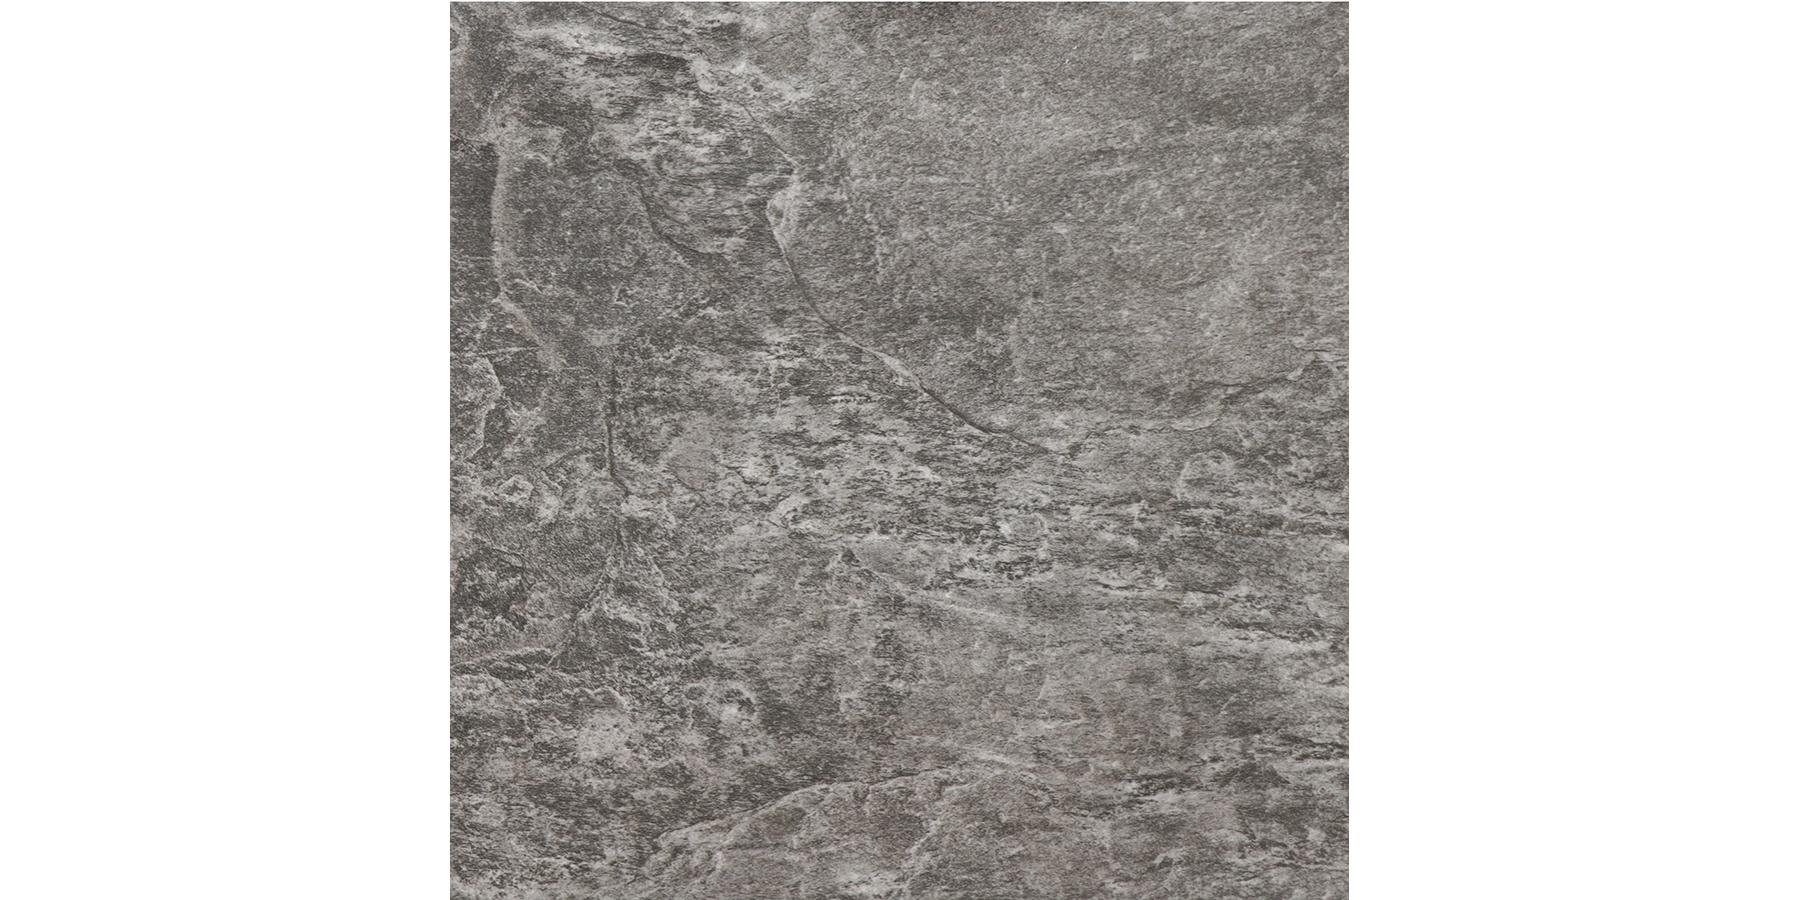 12x12 Himalaya Graphite Porcelain Tile